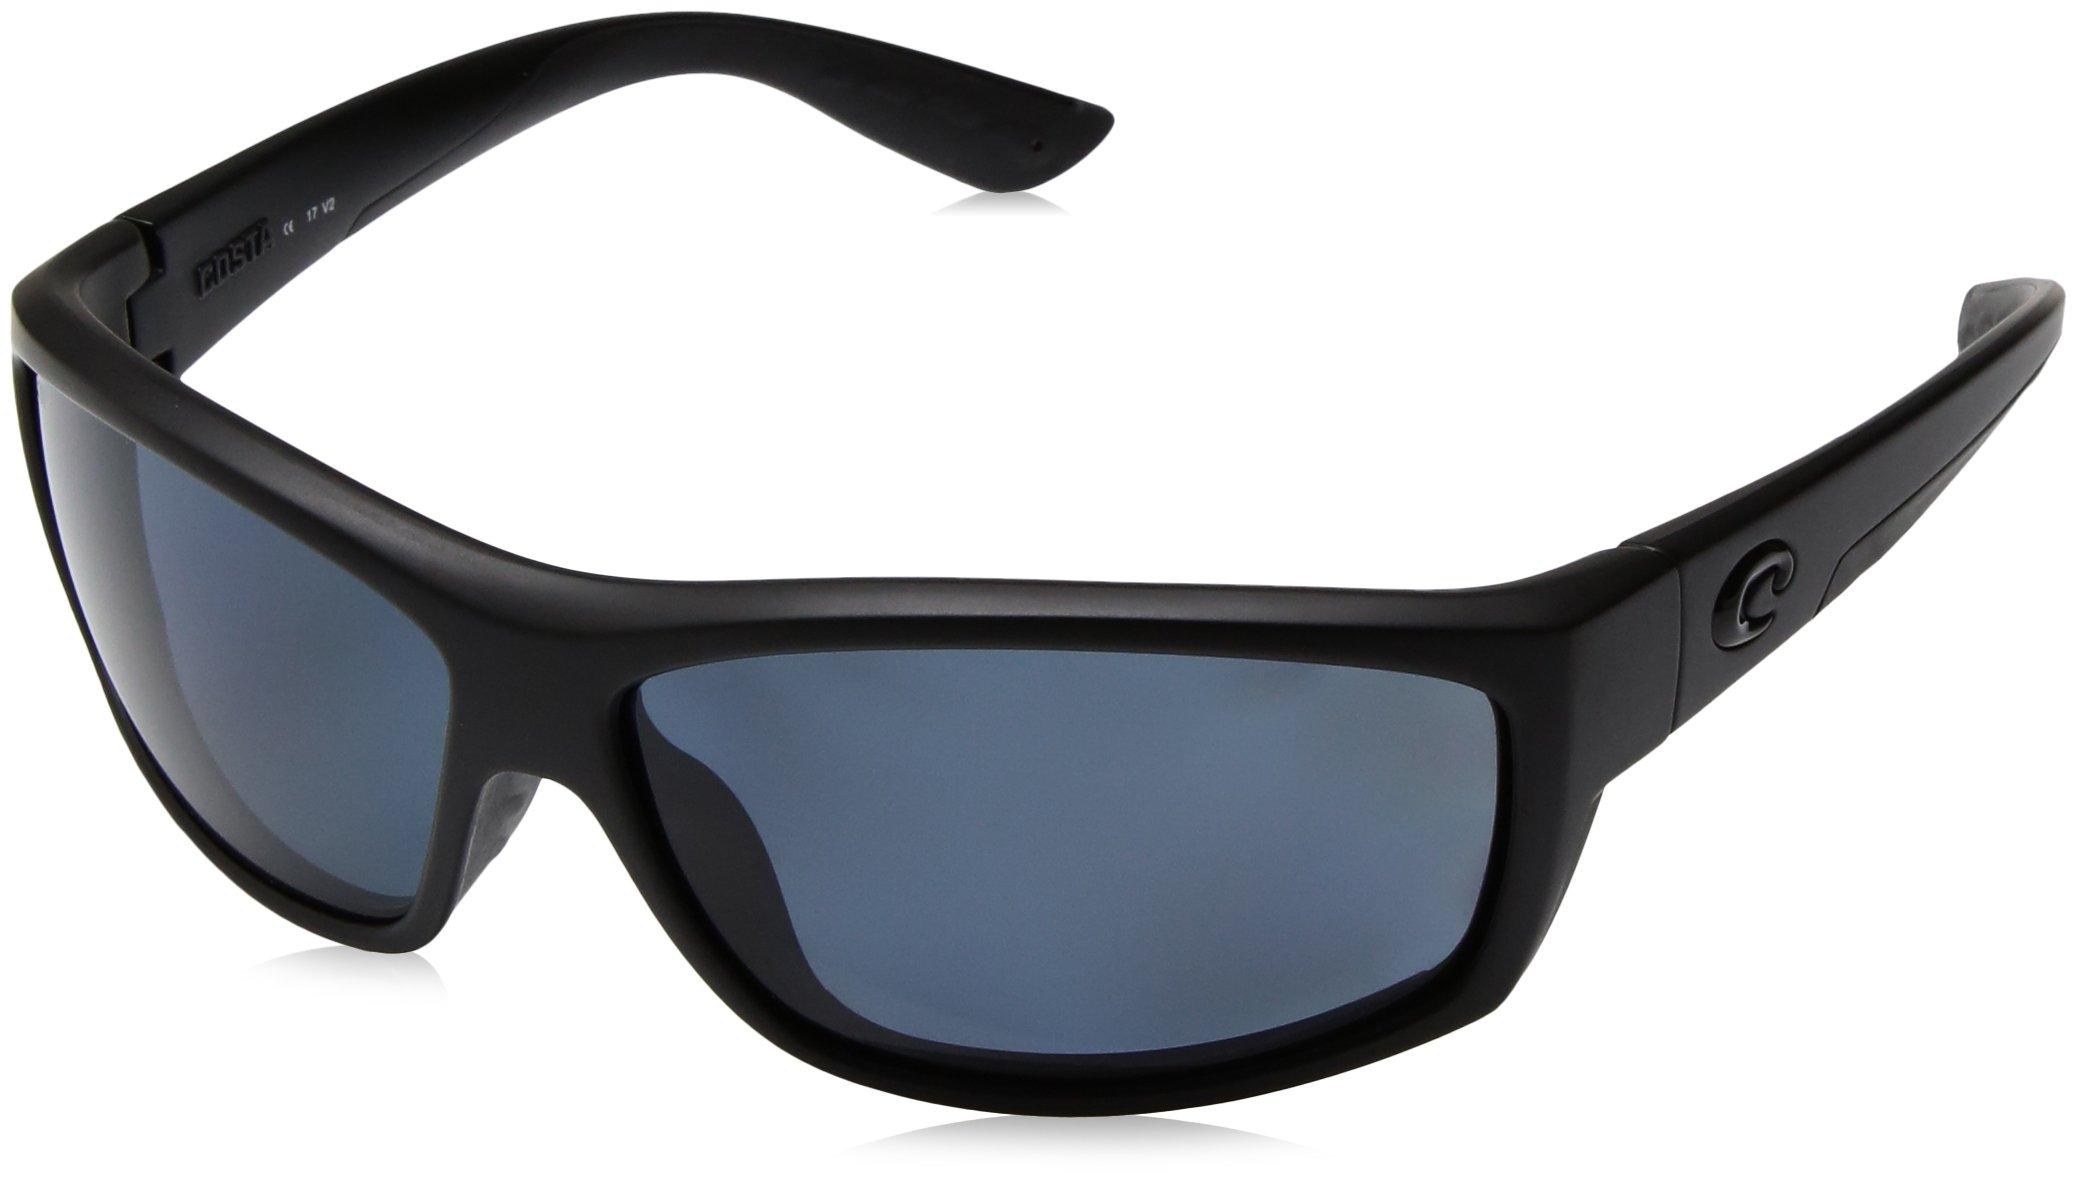 Costa del Mar Men's Saltbreak Polarized Iridium Oval Sunglasses, Blackout/Blue Mirror, 64.6 mm